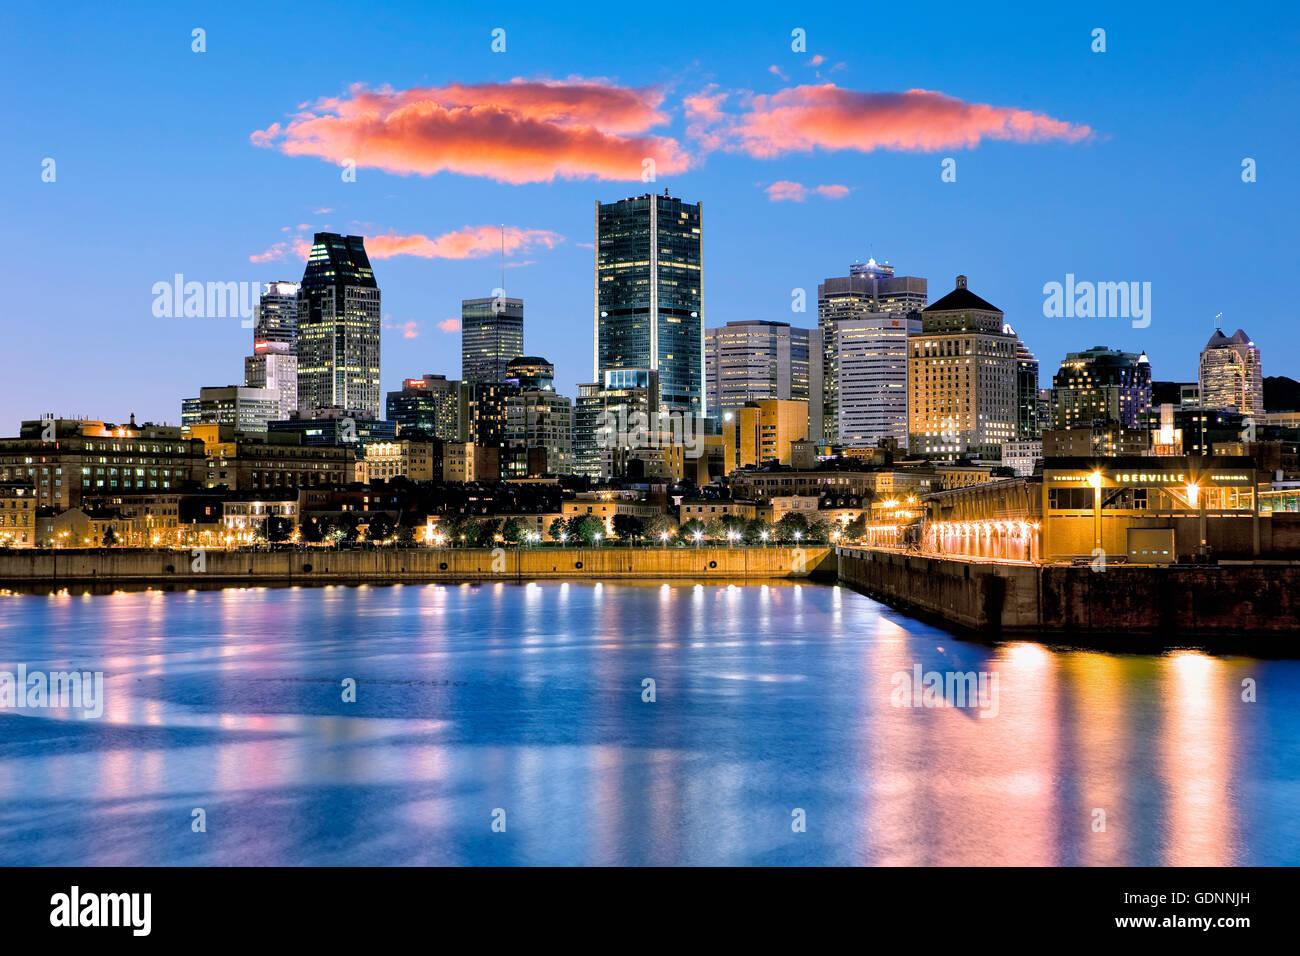 Montreal  skyline at night - Stock Image